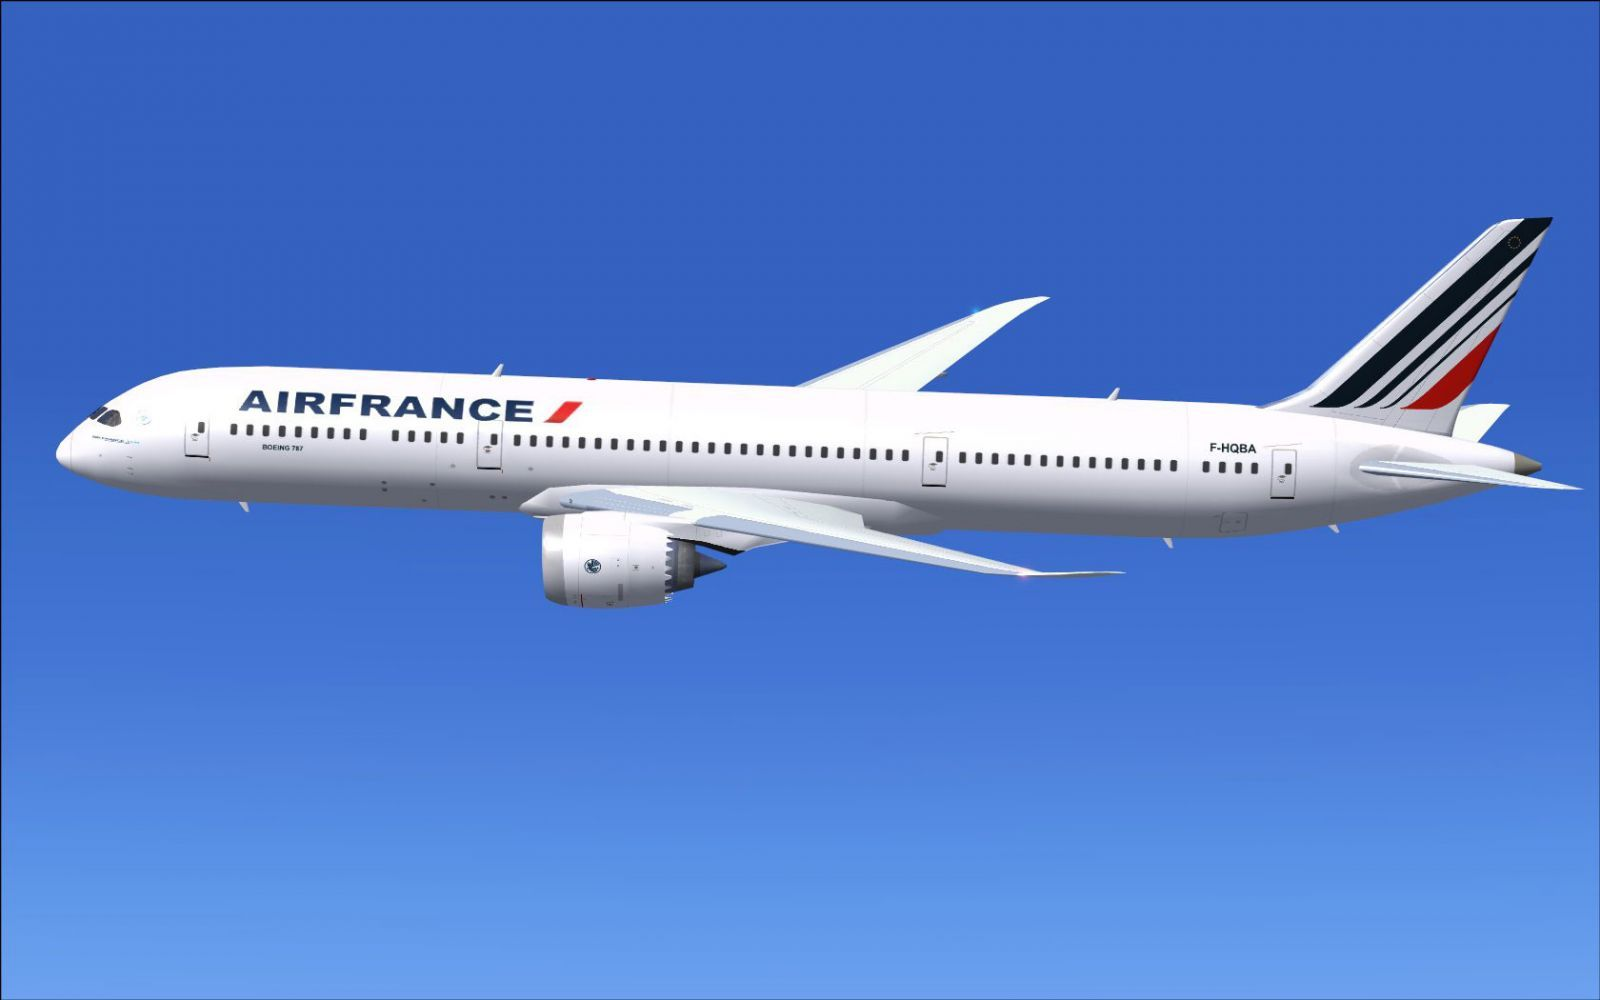 le boeing air france | air france boeing 787-9 in flight. | ferid